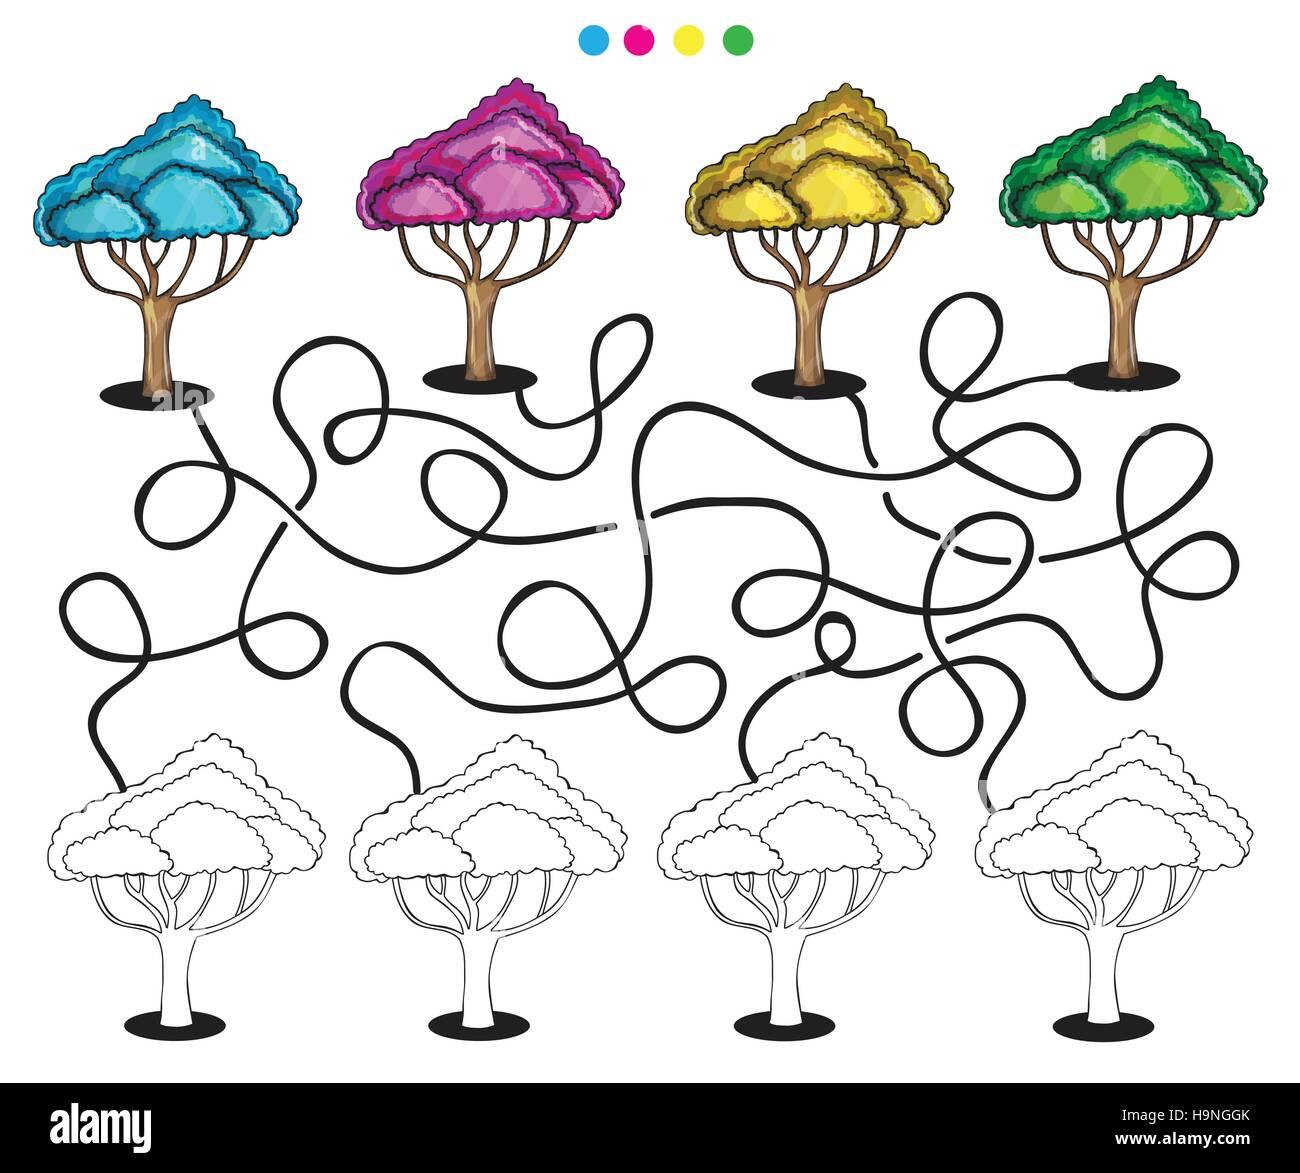 Brain Tree Illustration Tree Knowledge Stockfotos & Brain Tree ...